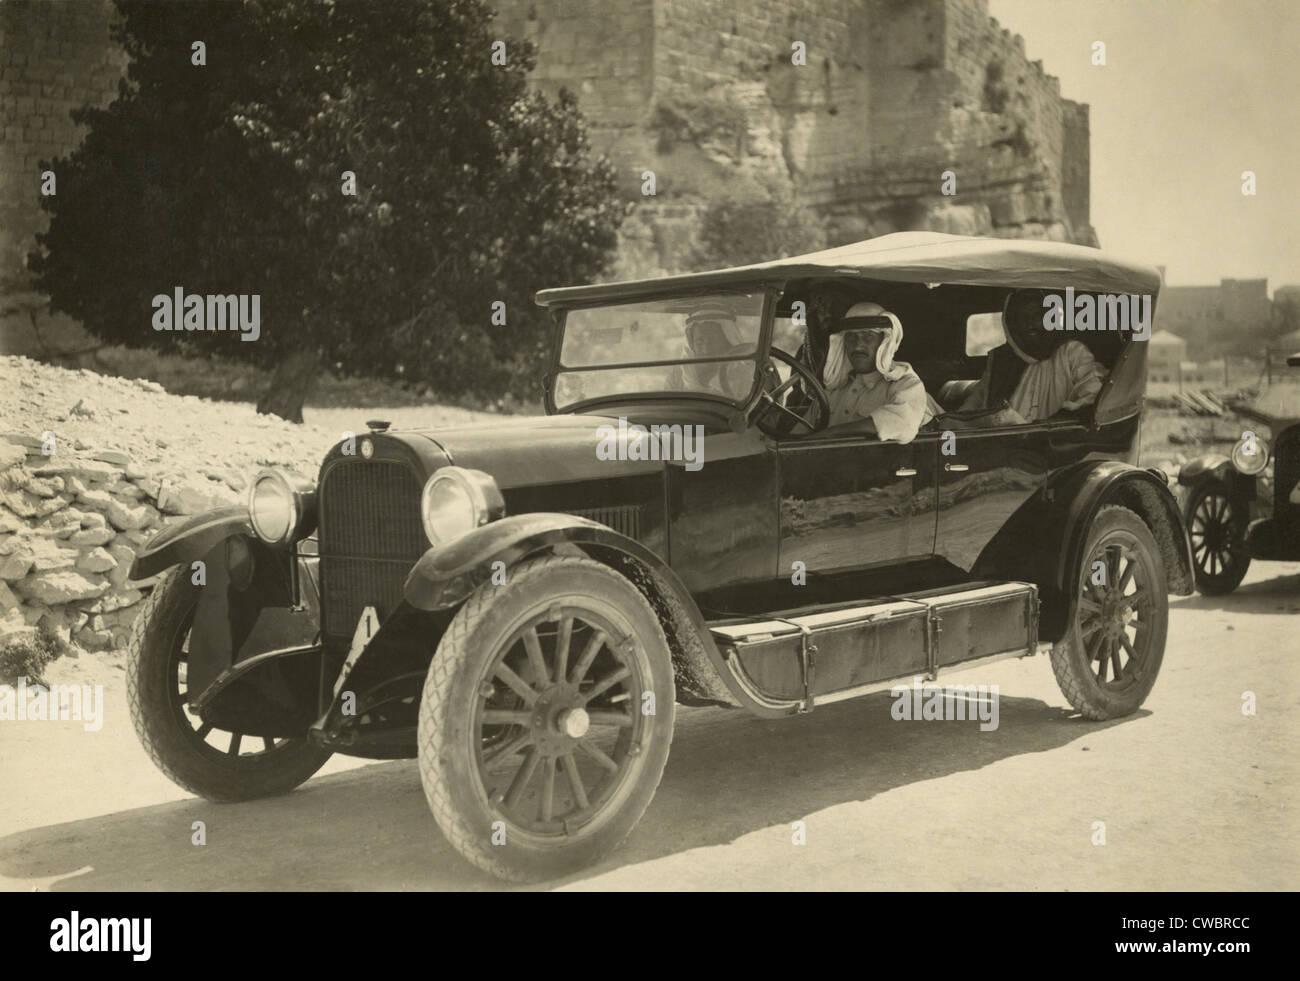 Arab men wearing traditional keffiyeh in a passenger car in the ...